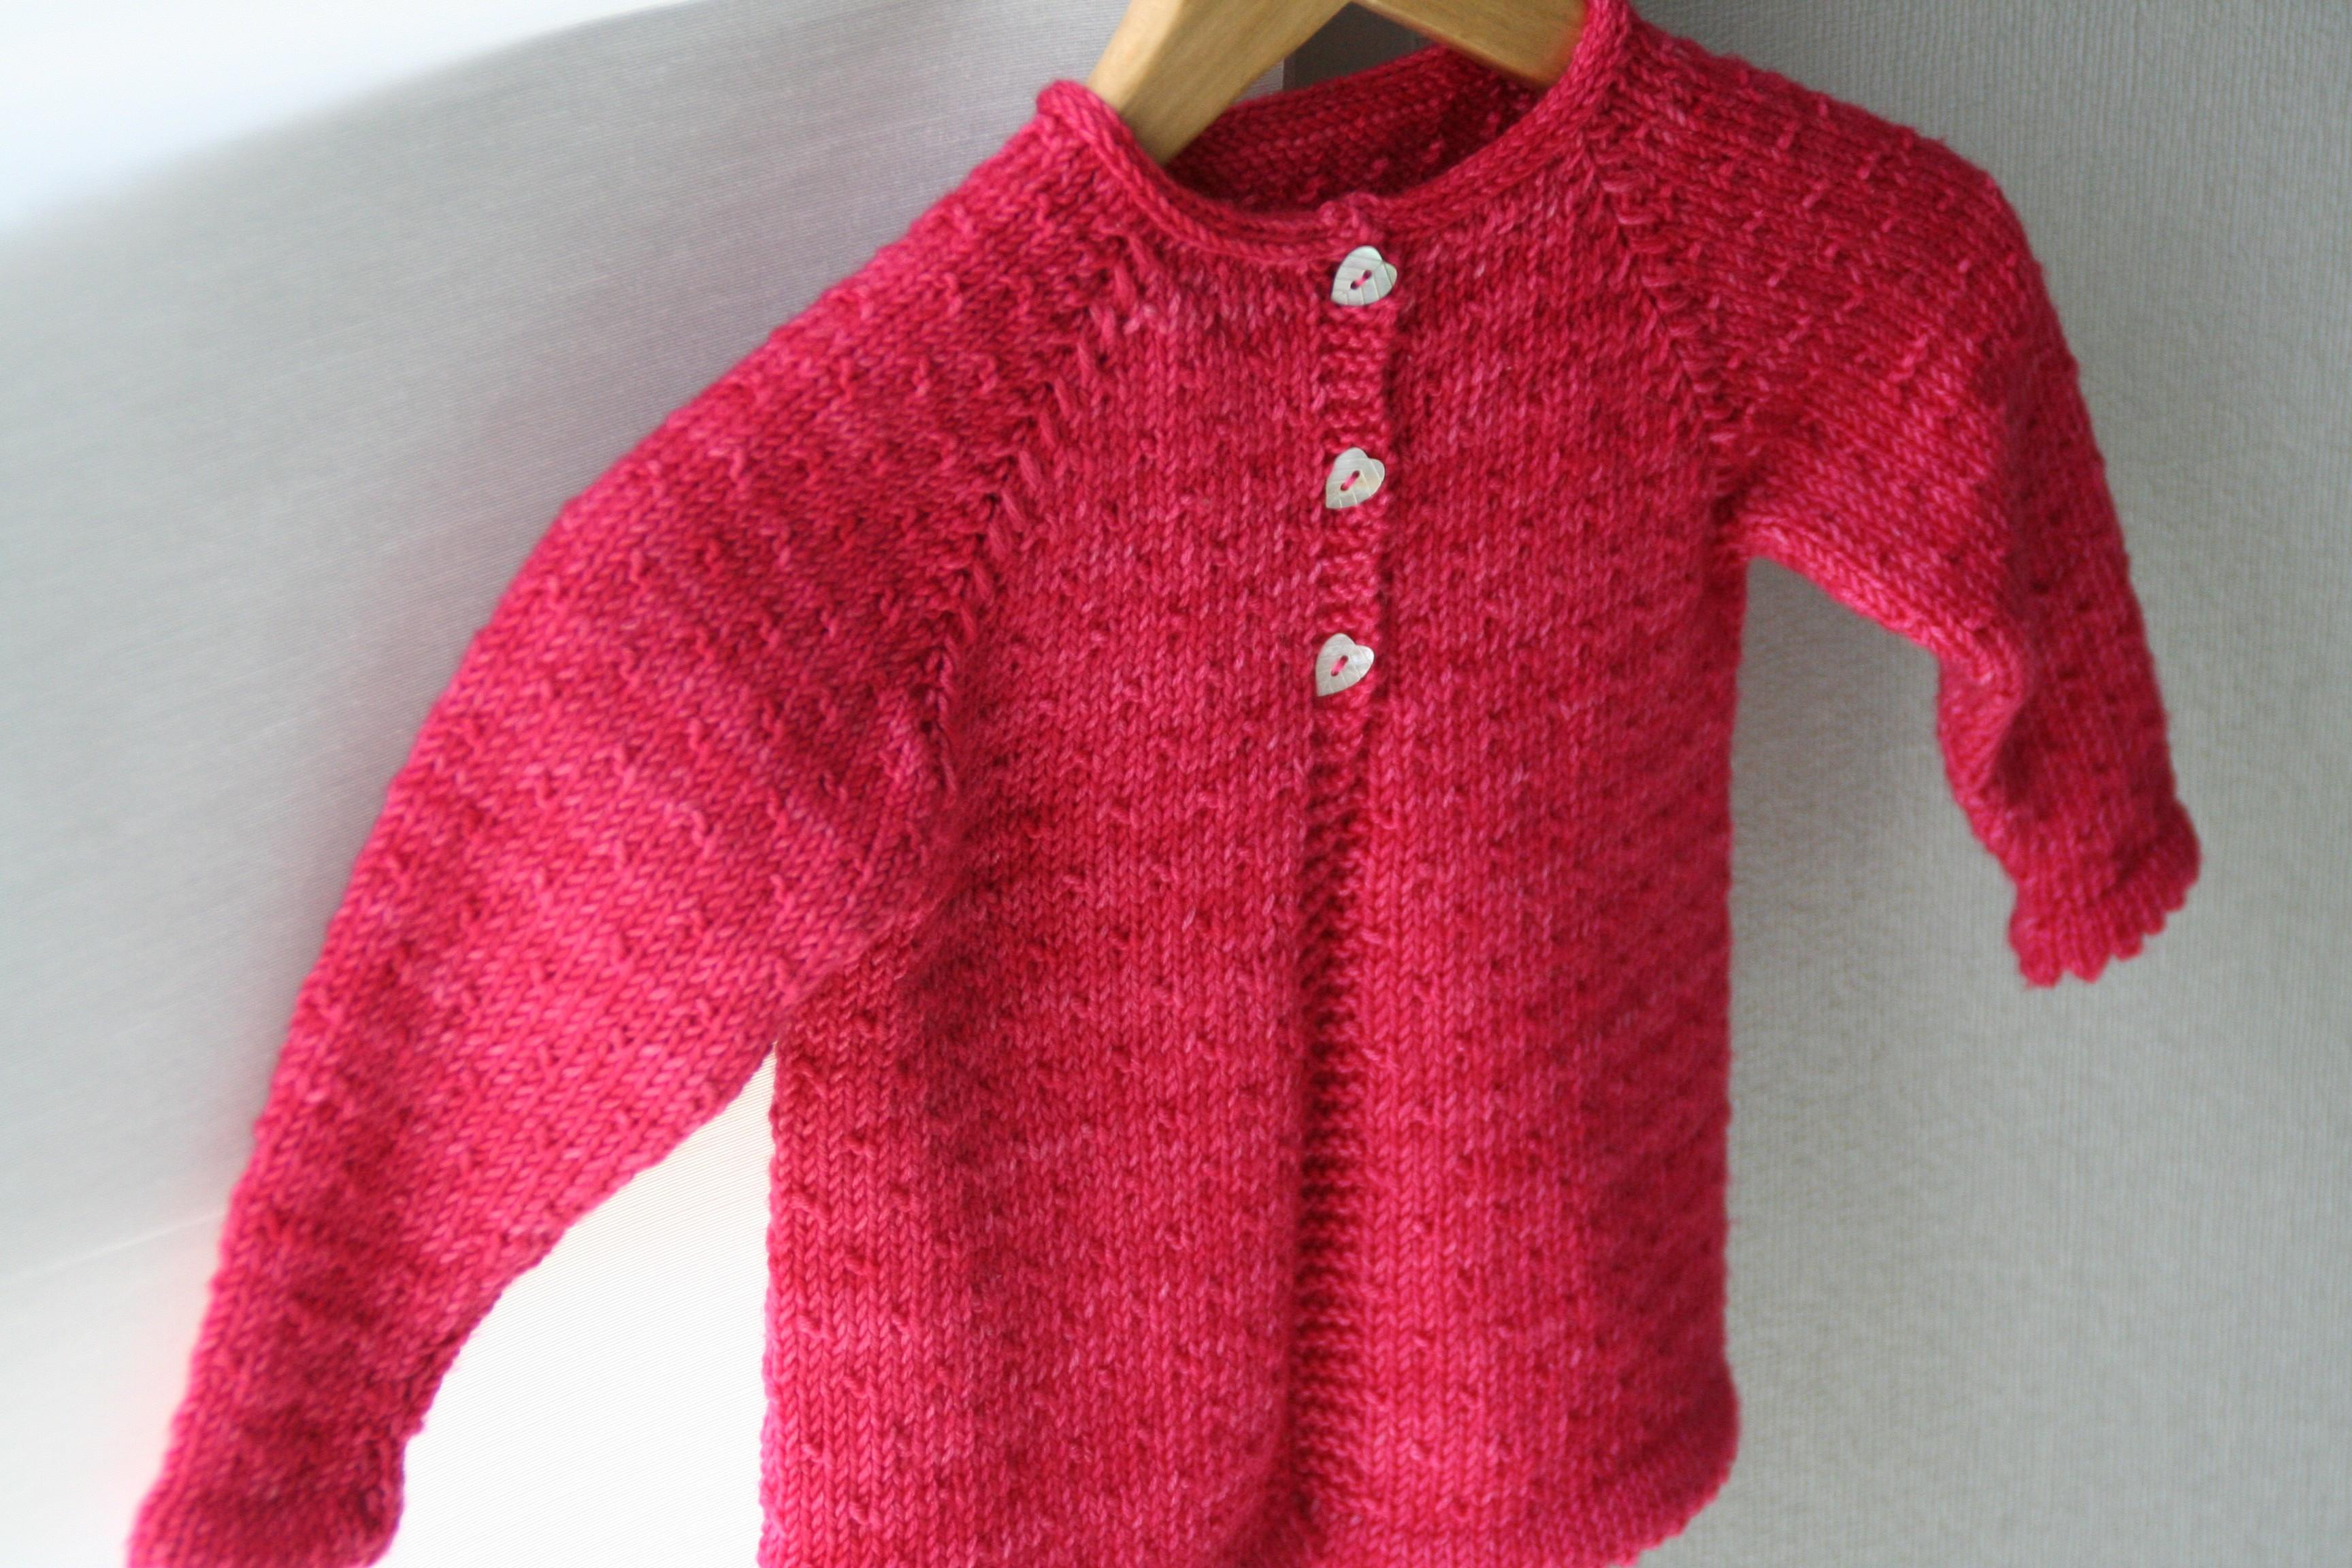 Semis de Printemps - Cardigan bebe&enfant 1m-10a - Tricot